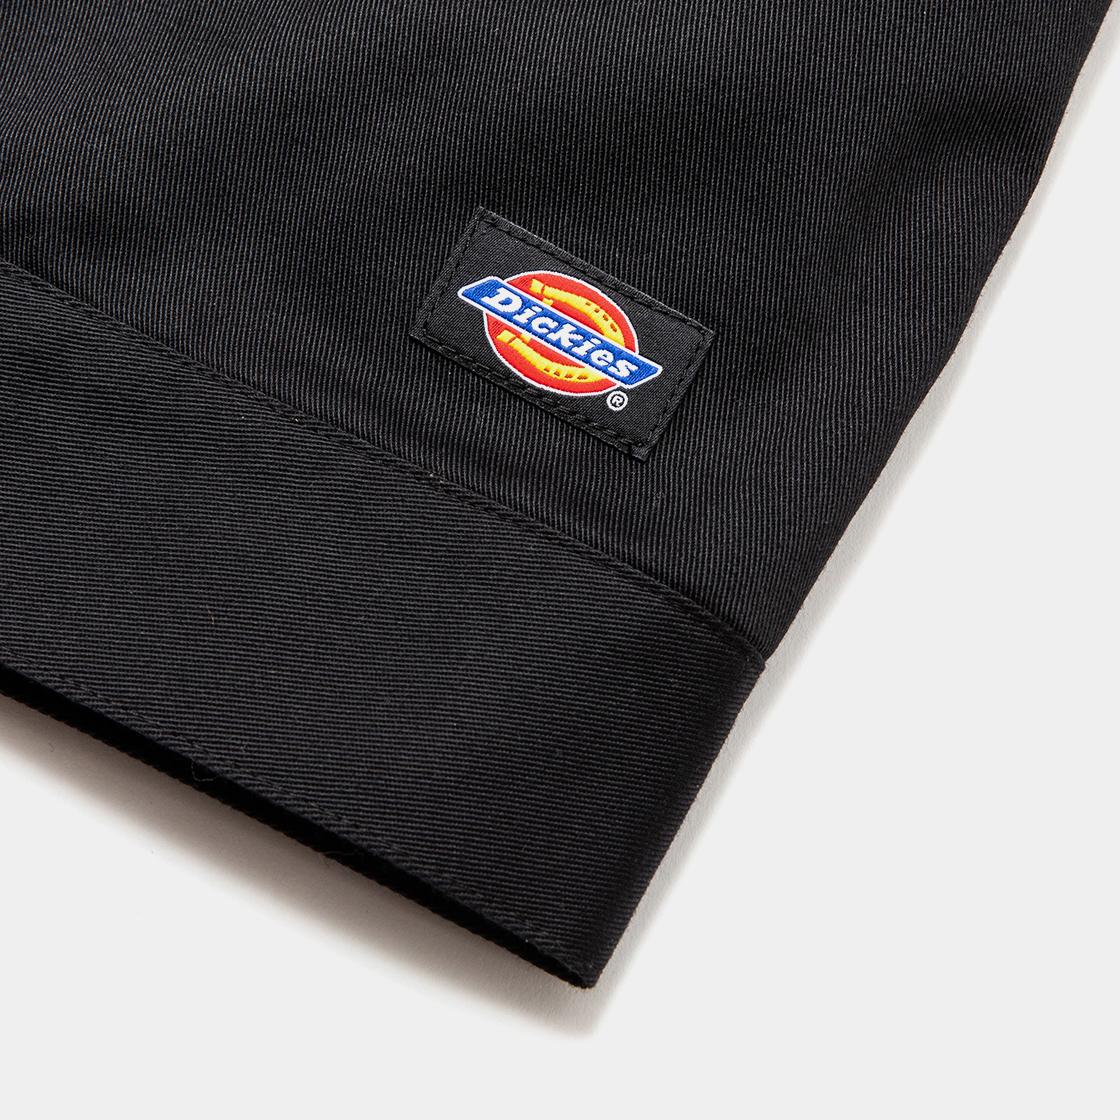 Pleated Sleeve Blouse×Dickies® / Black